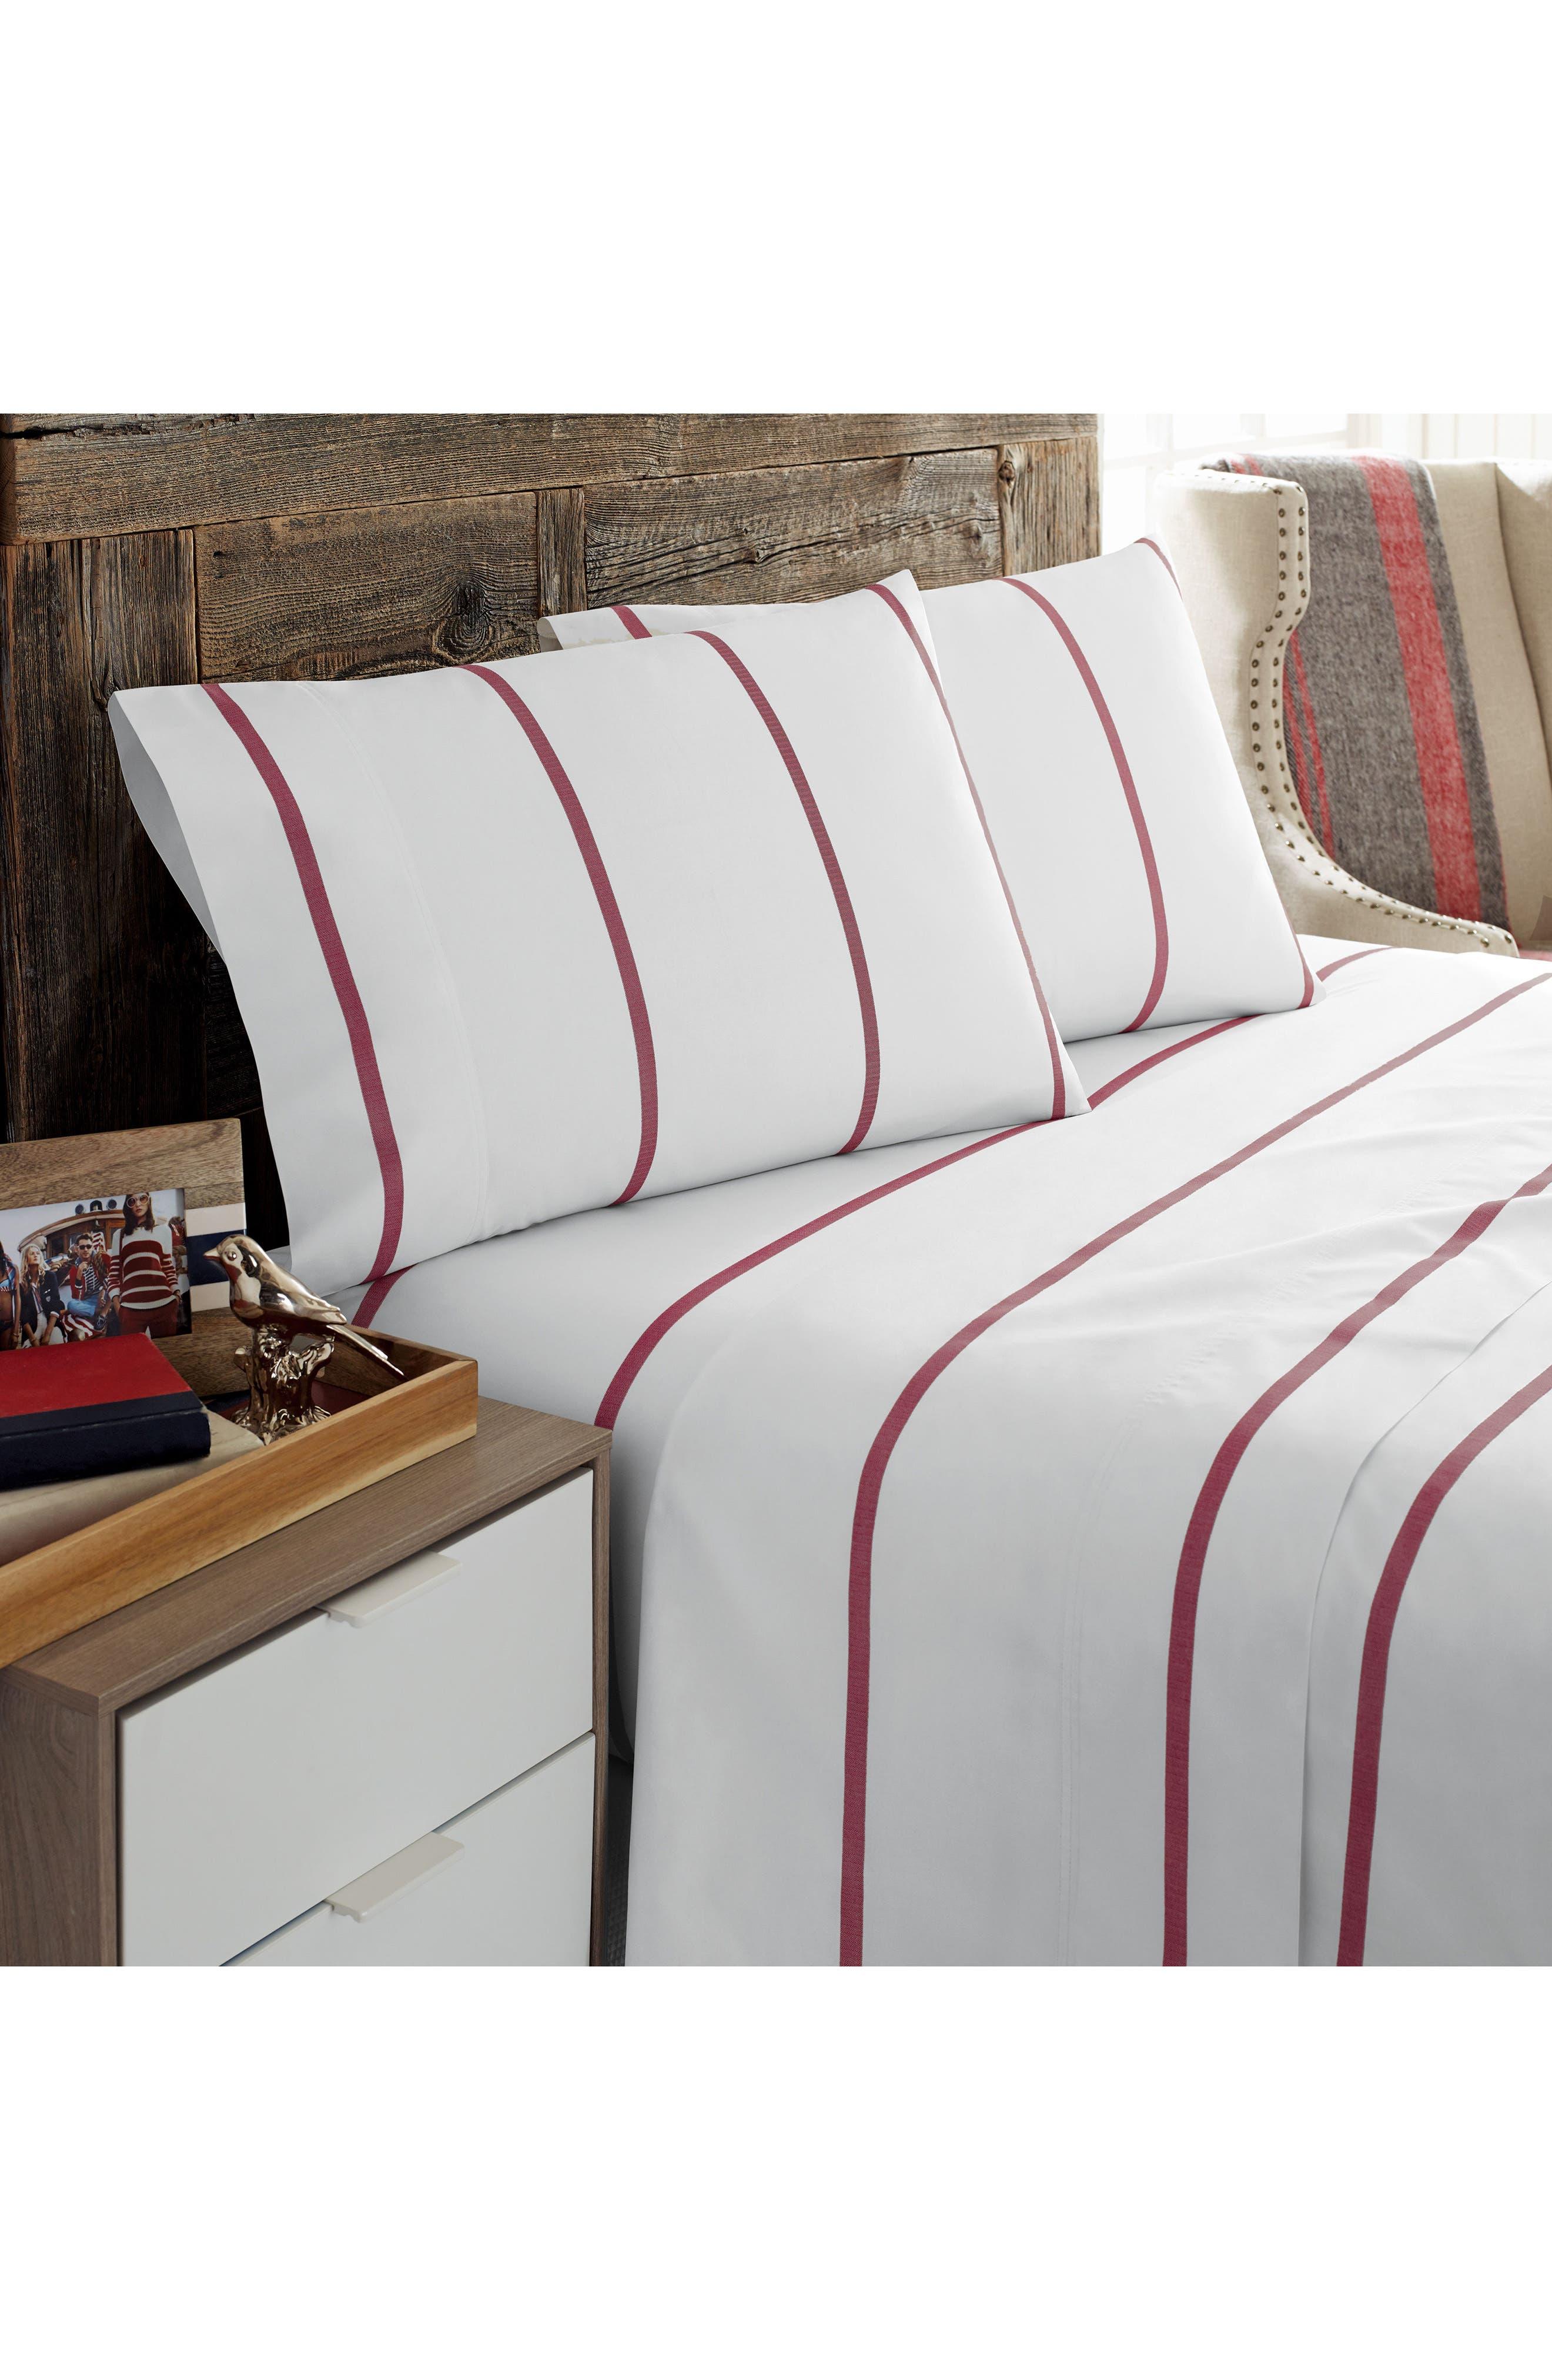 Main Image - Tommy Hilfiger Sutton Stripe Pillowcases